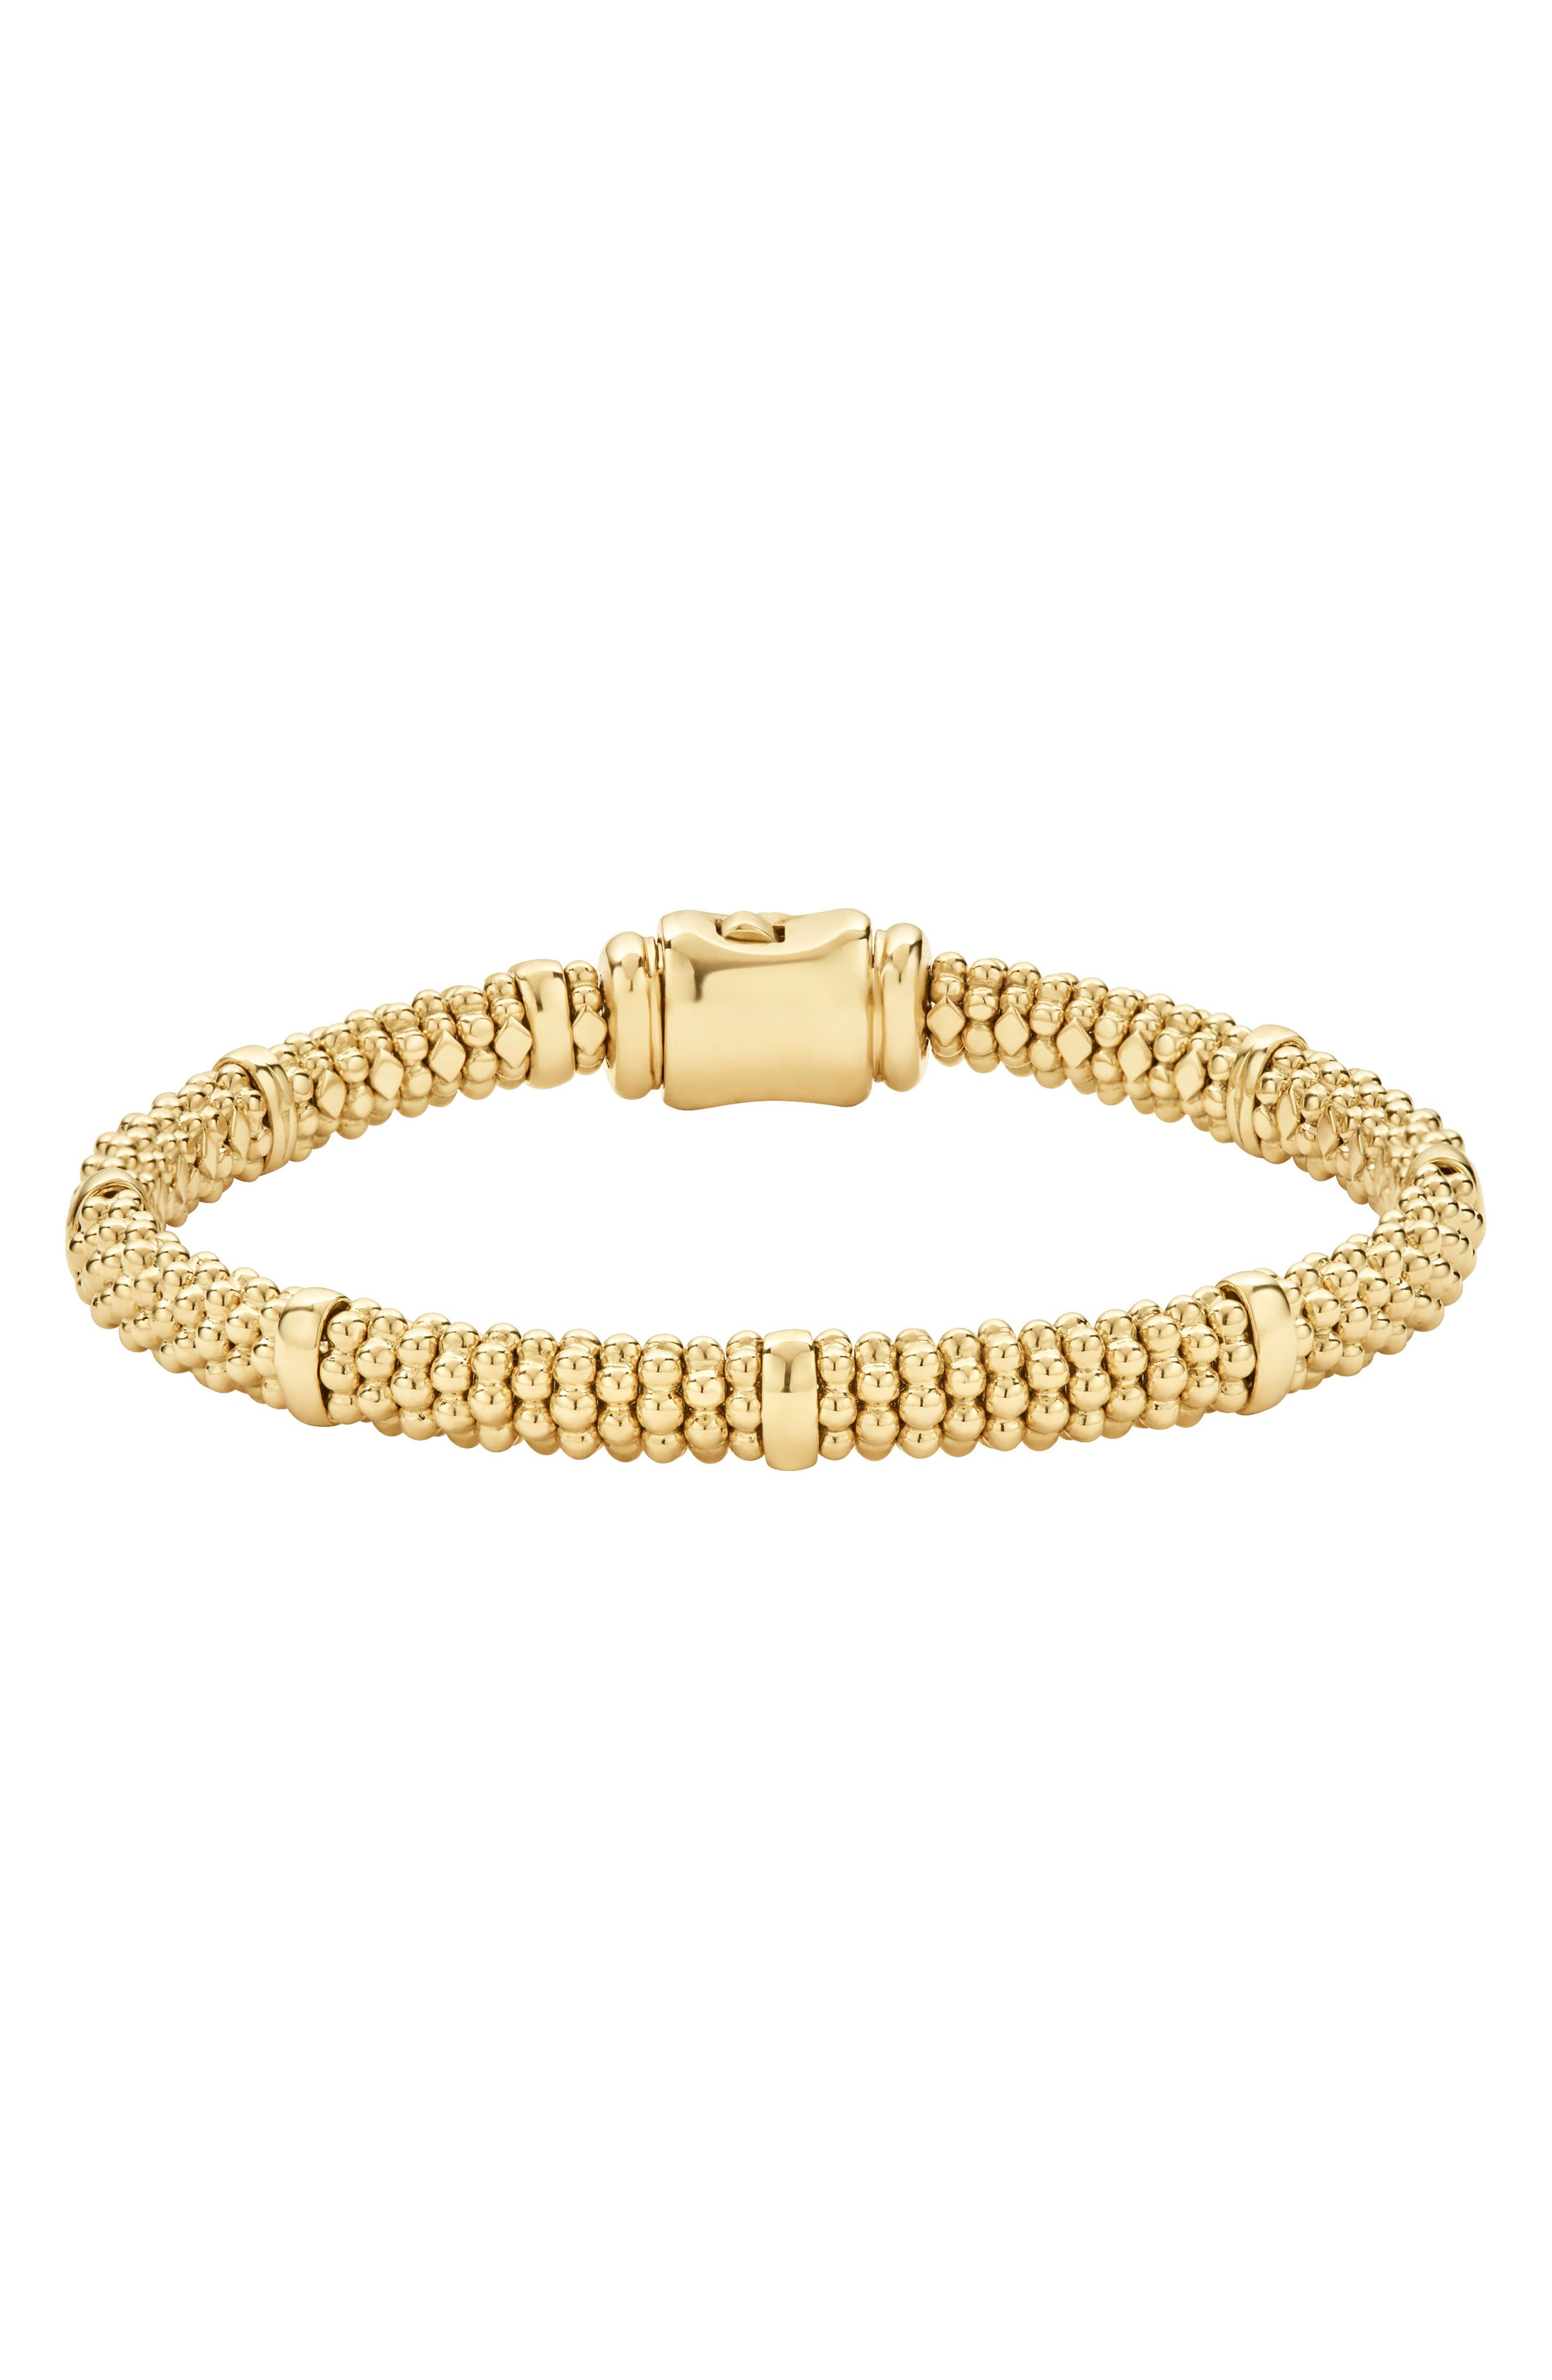 Caviar Rope Bracelet,                             Alternate thumbnail 2, color,                             GOLD